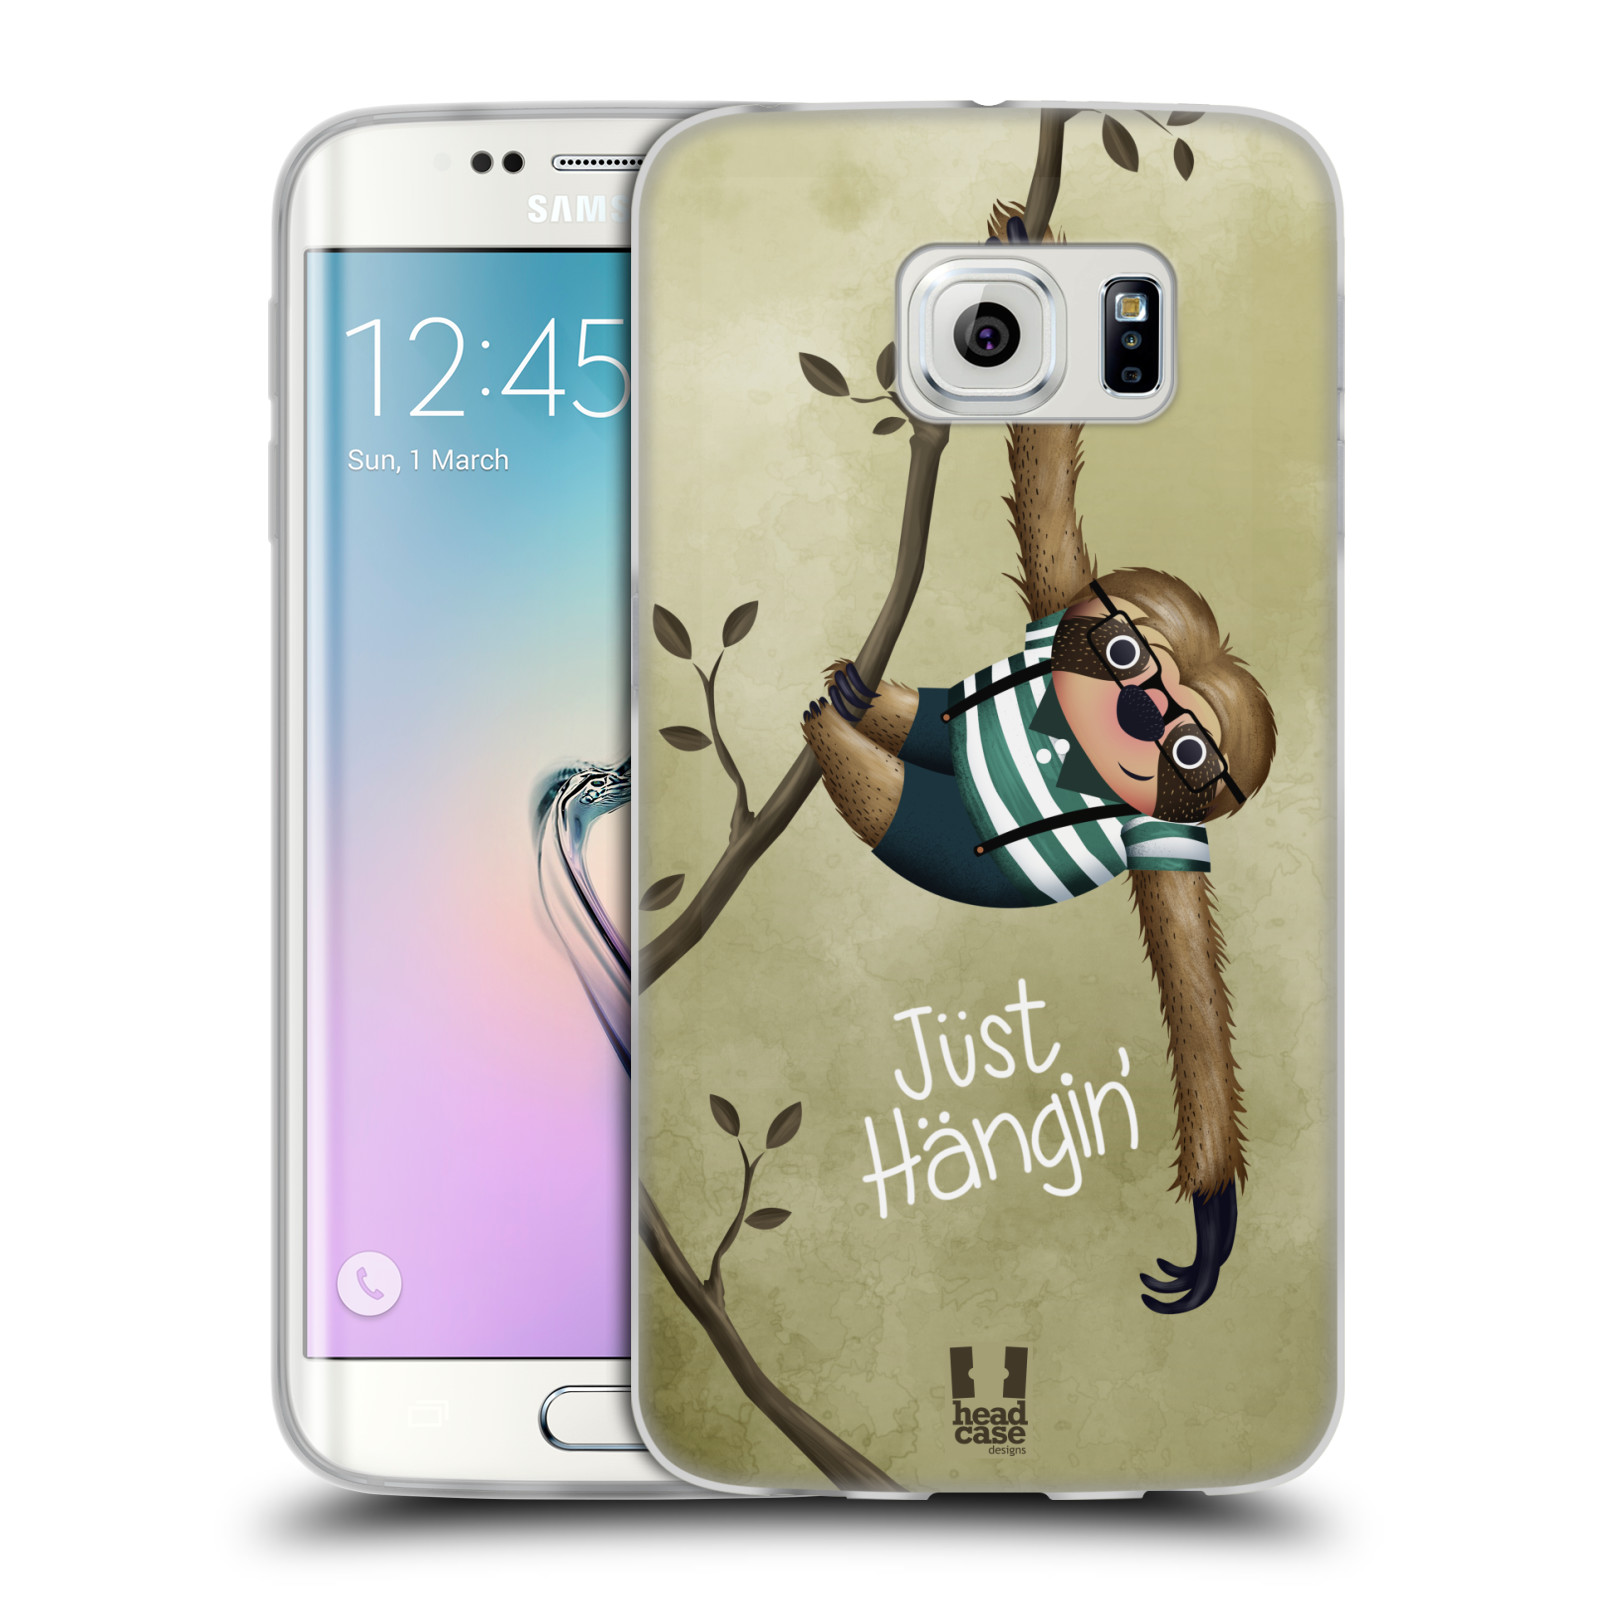 Silikonové pouzdro na mobil Samsung Galaxy S6 Edge HEAD CASE Lenochod Just Hangin (Silikonový kryt či obal na mobilní telefon Samsung Galaxy S6 Edge SM-G925F)